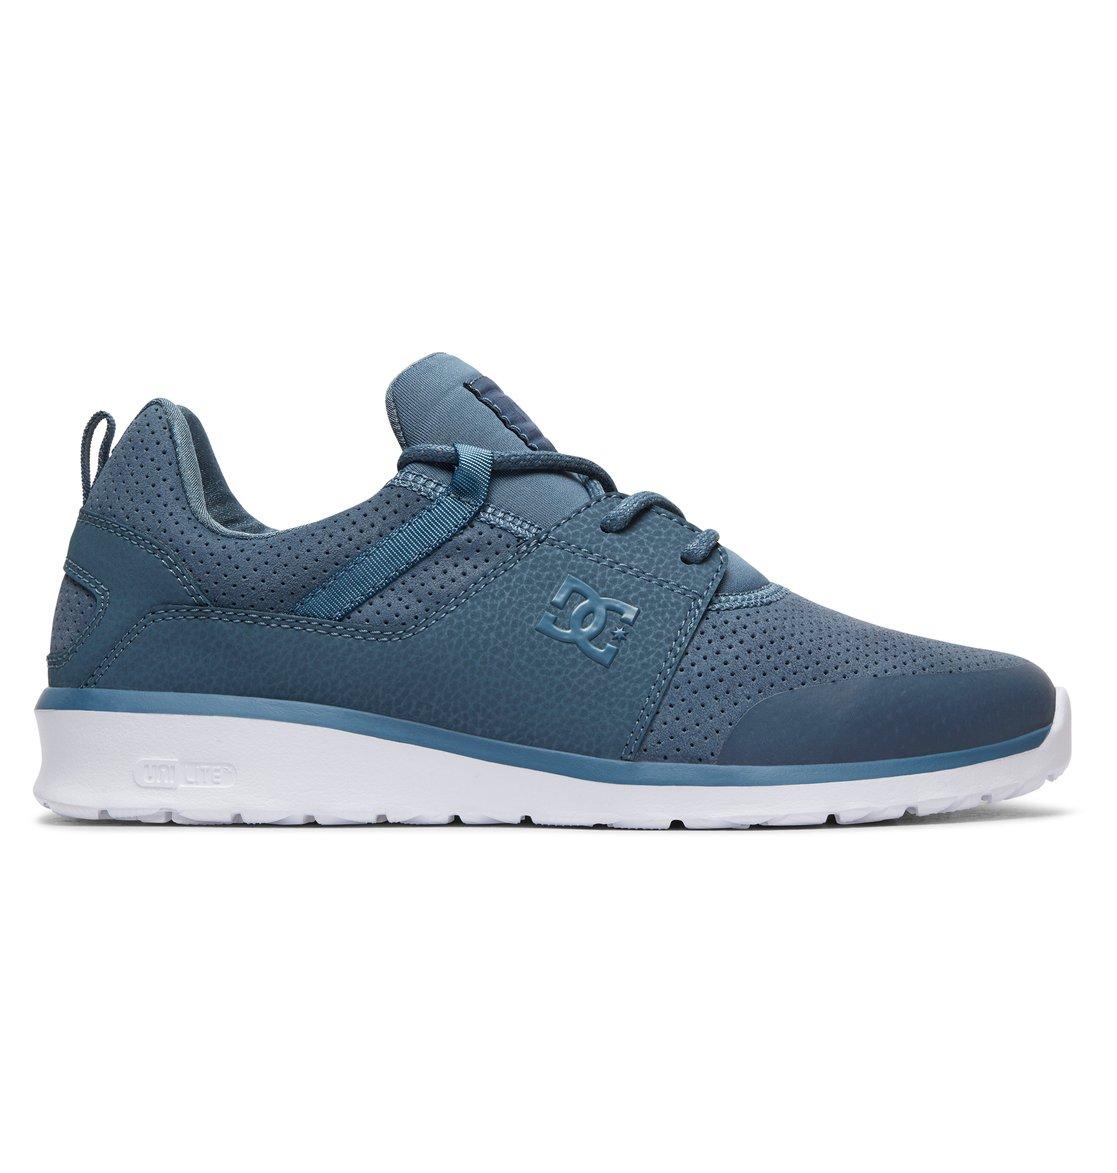 d7248aaa6d 0 Tenis Masculino DC Shoes Heathrow Prestige Azul BRADYS700084 DC Shoes